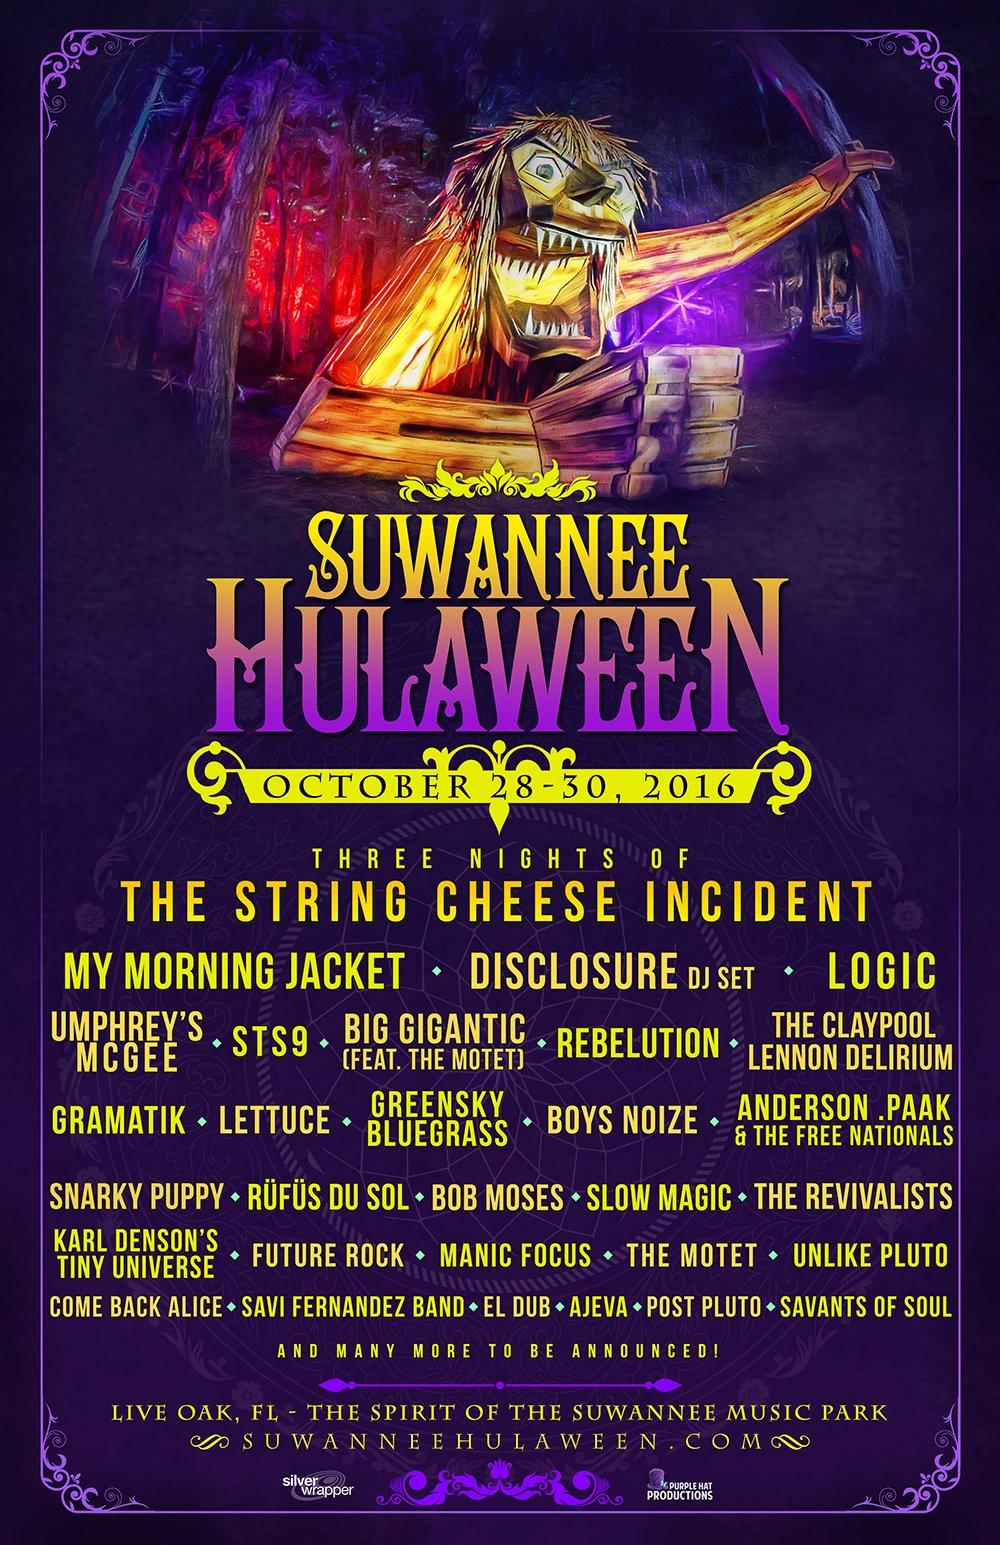 Suwannee Hulaween 2016 initial lineup. Photo by: Suwannee Hulaween / Twitter